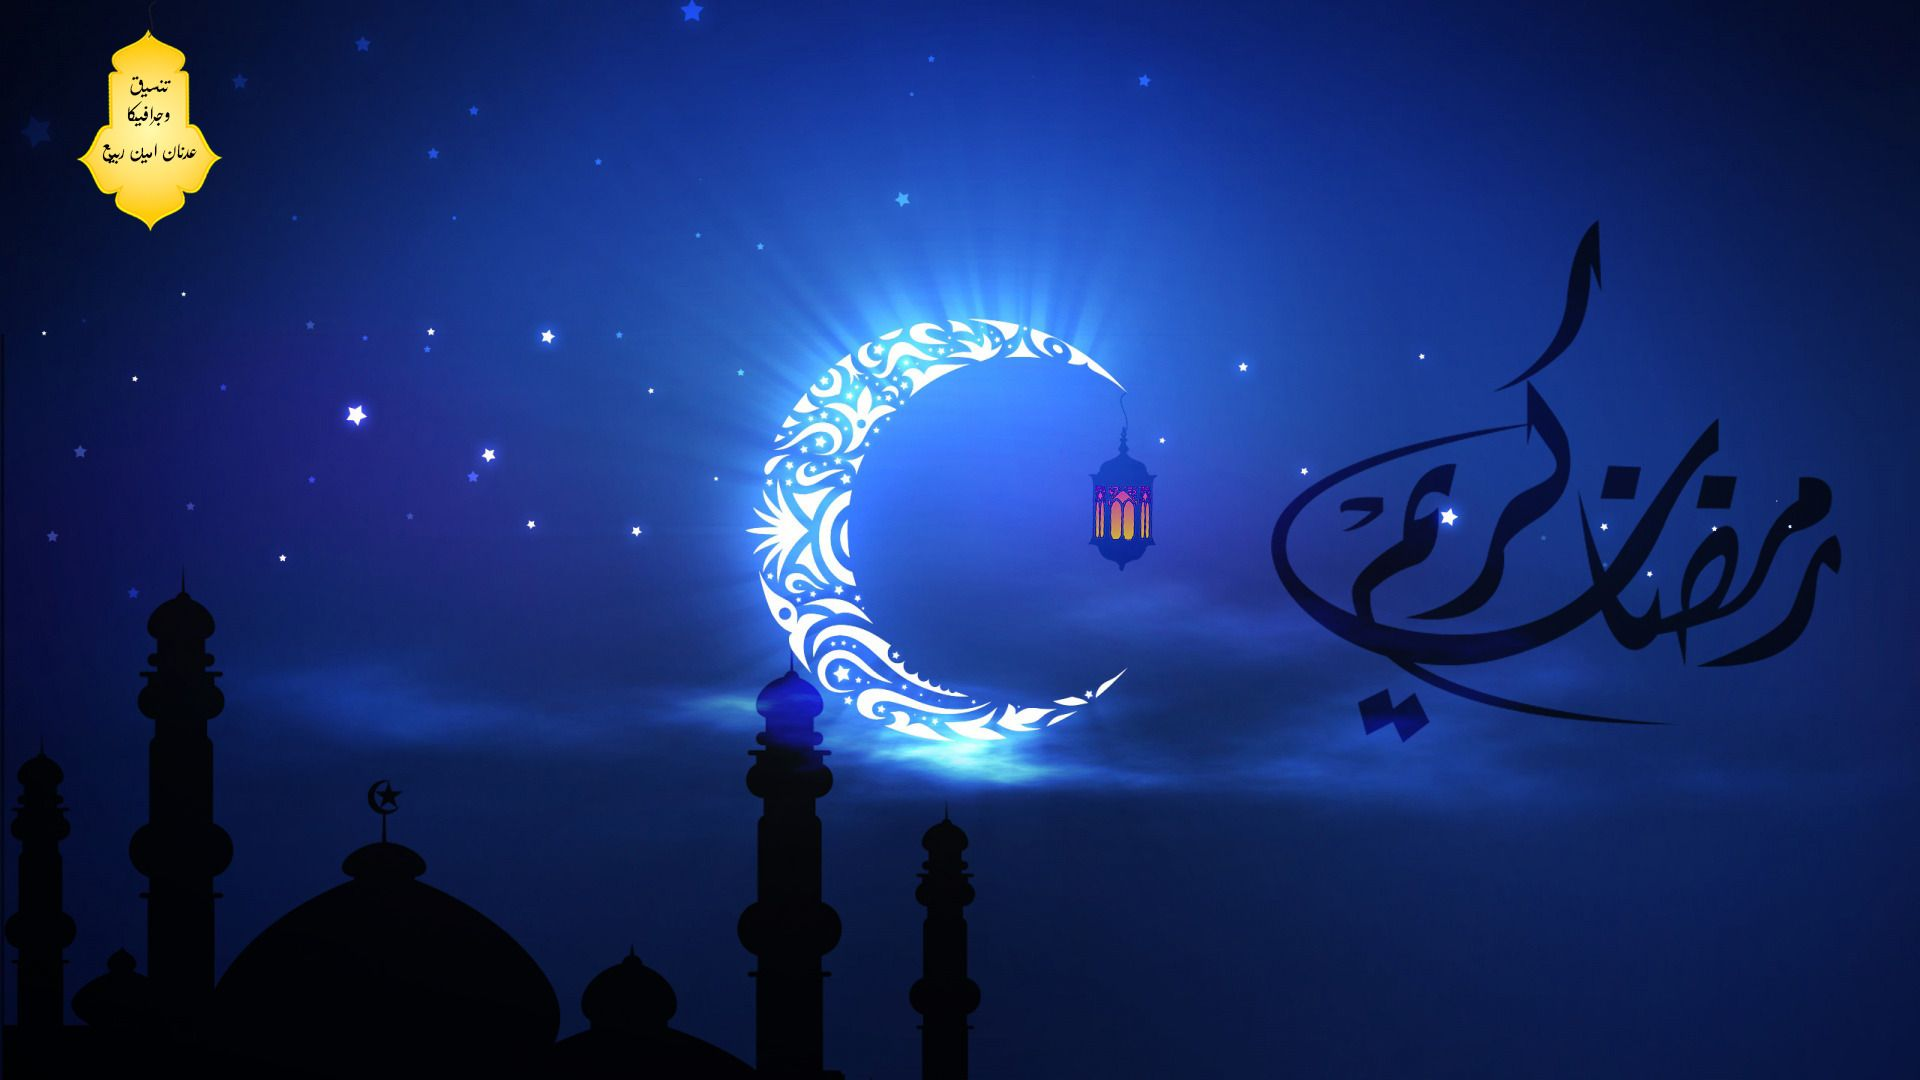 Ramadan Kareem World Hd Wallpaper Free Download Islamic Wallpaper Ramadan Kareem World Wallpaper